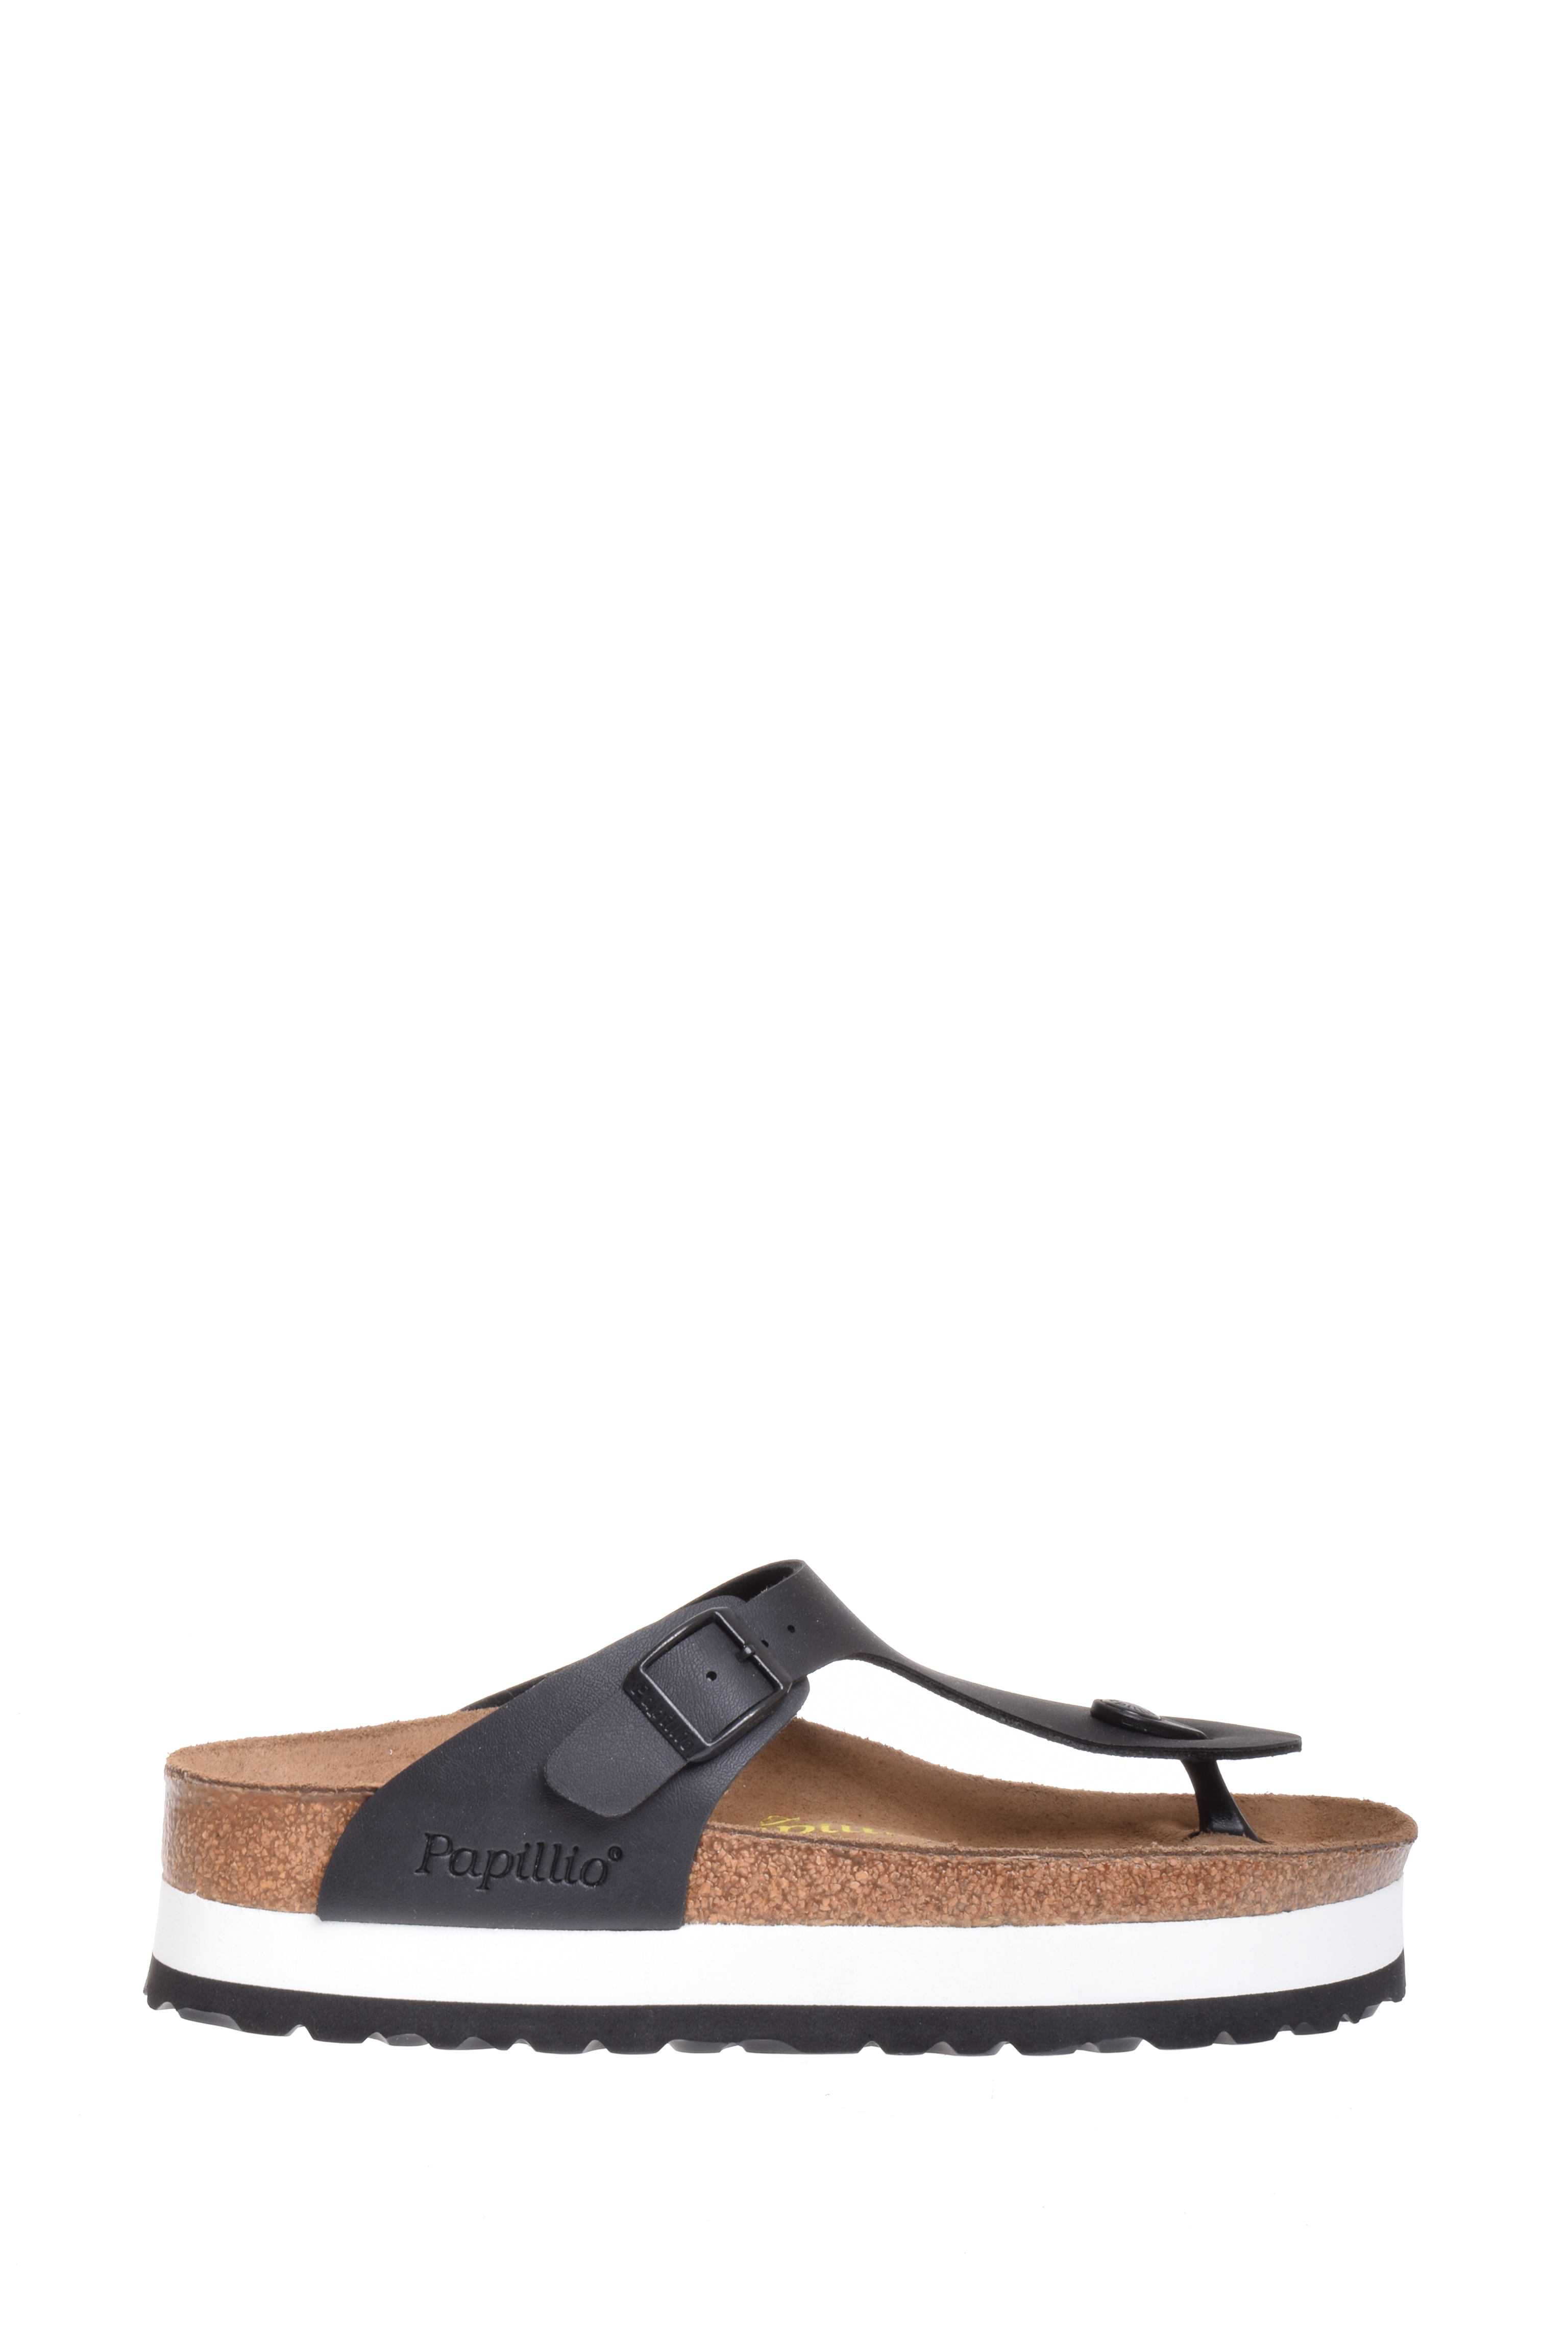 8dcdb07006 Papillio - Papillio Gizeh Birko-Flor Platform Sandal - Black - Walmart.com